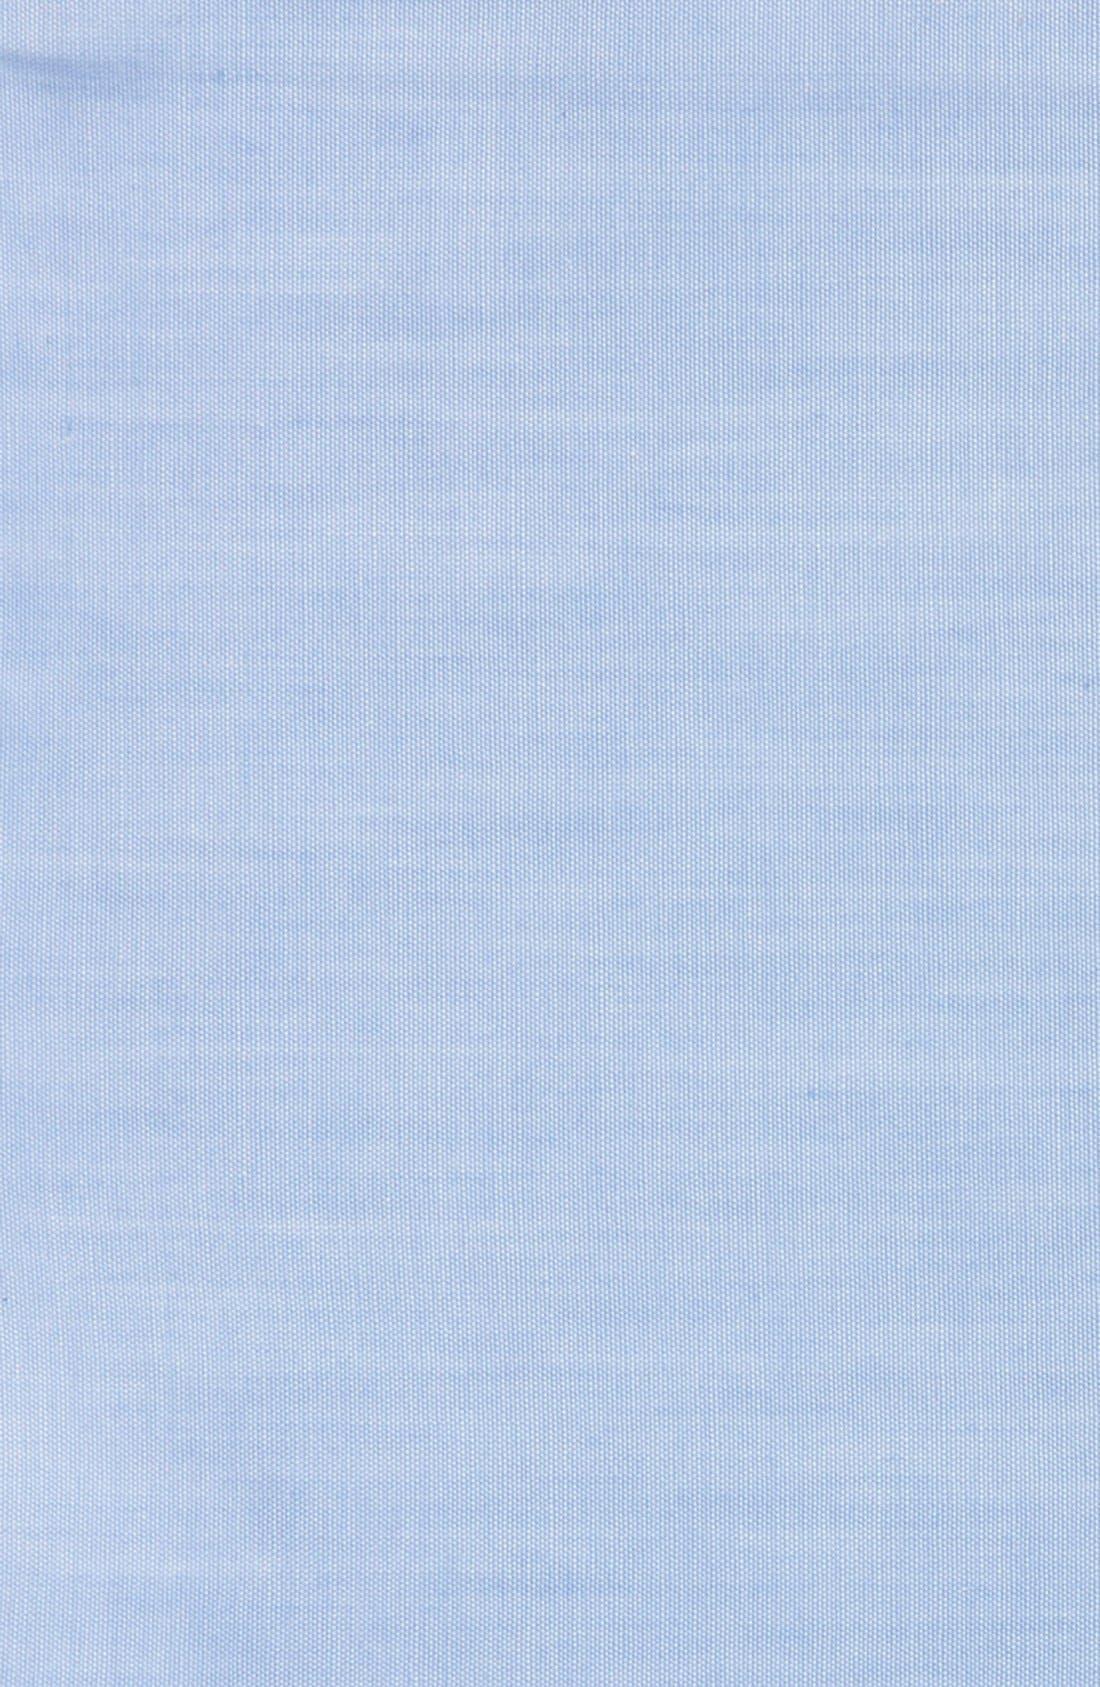 Chambray CottonPocket Square,                             Alternate thumbnail 6, color,                             455